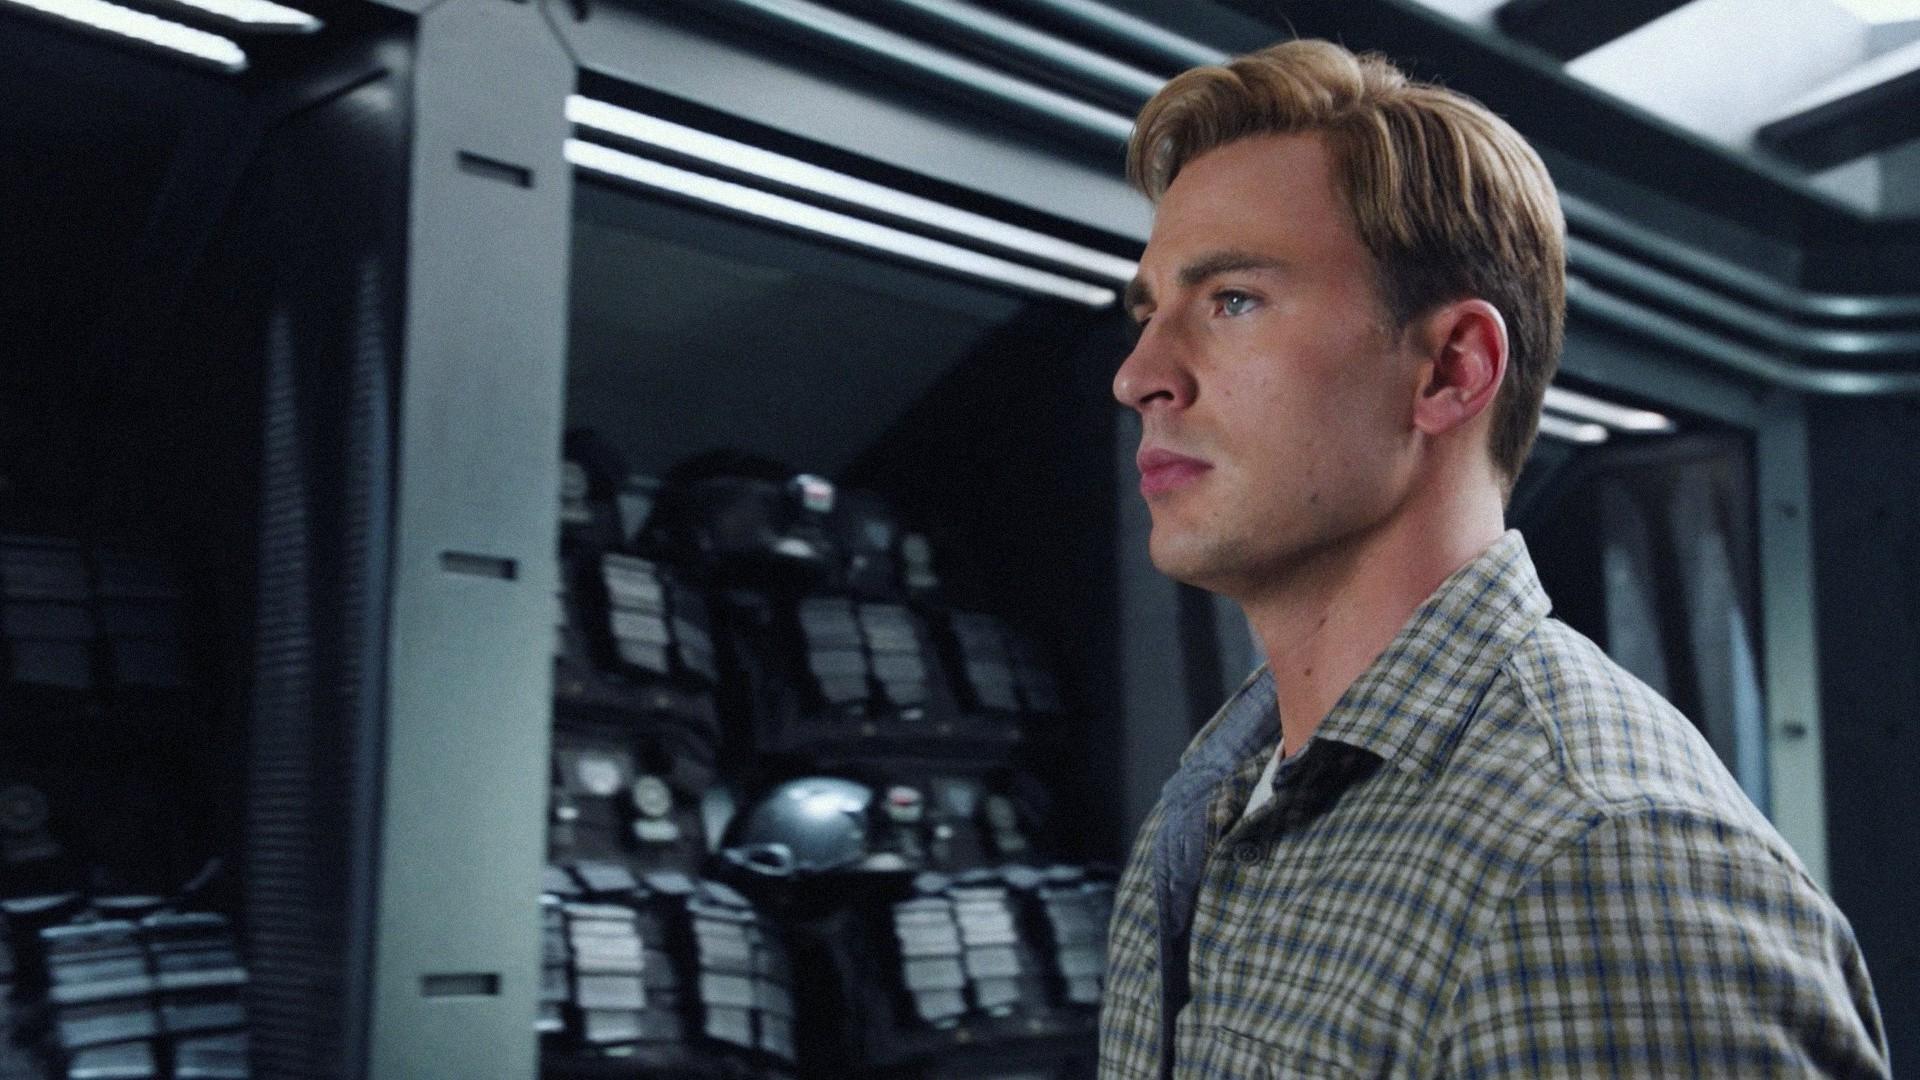 wallpaper : movies, captain america, the avengers, chris evans